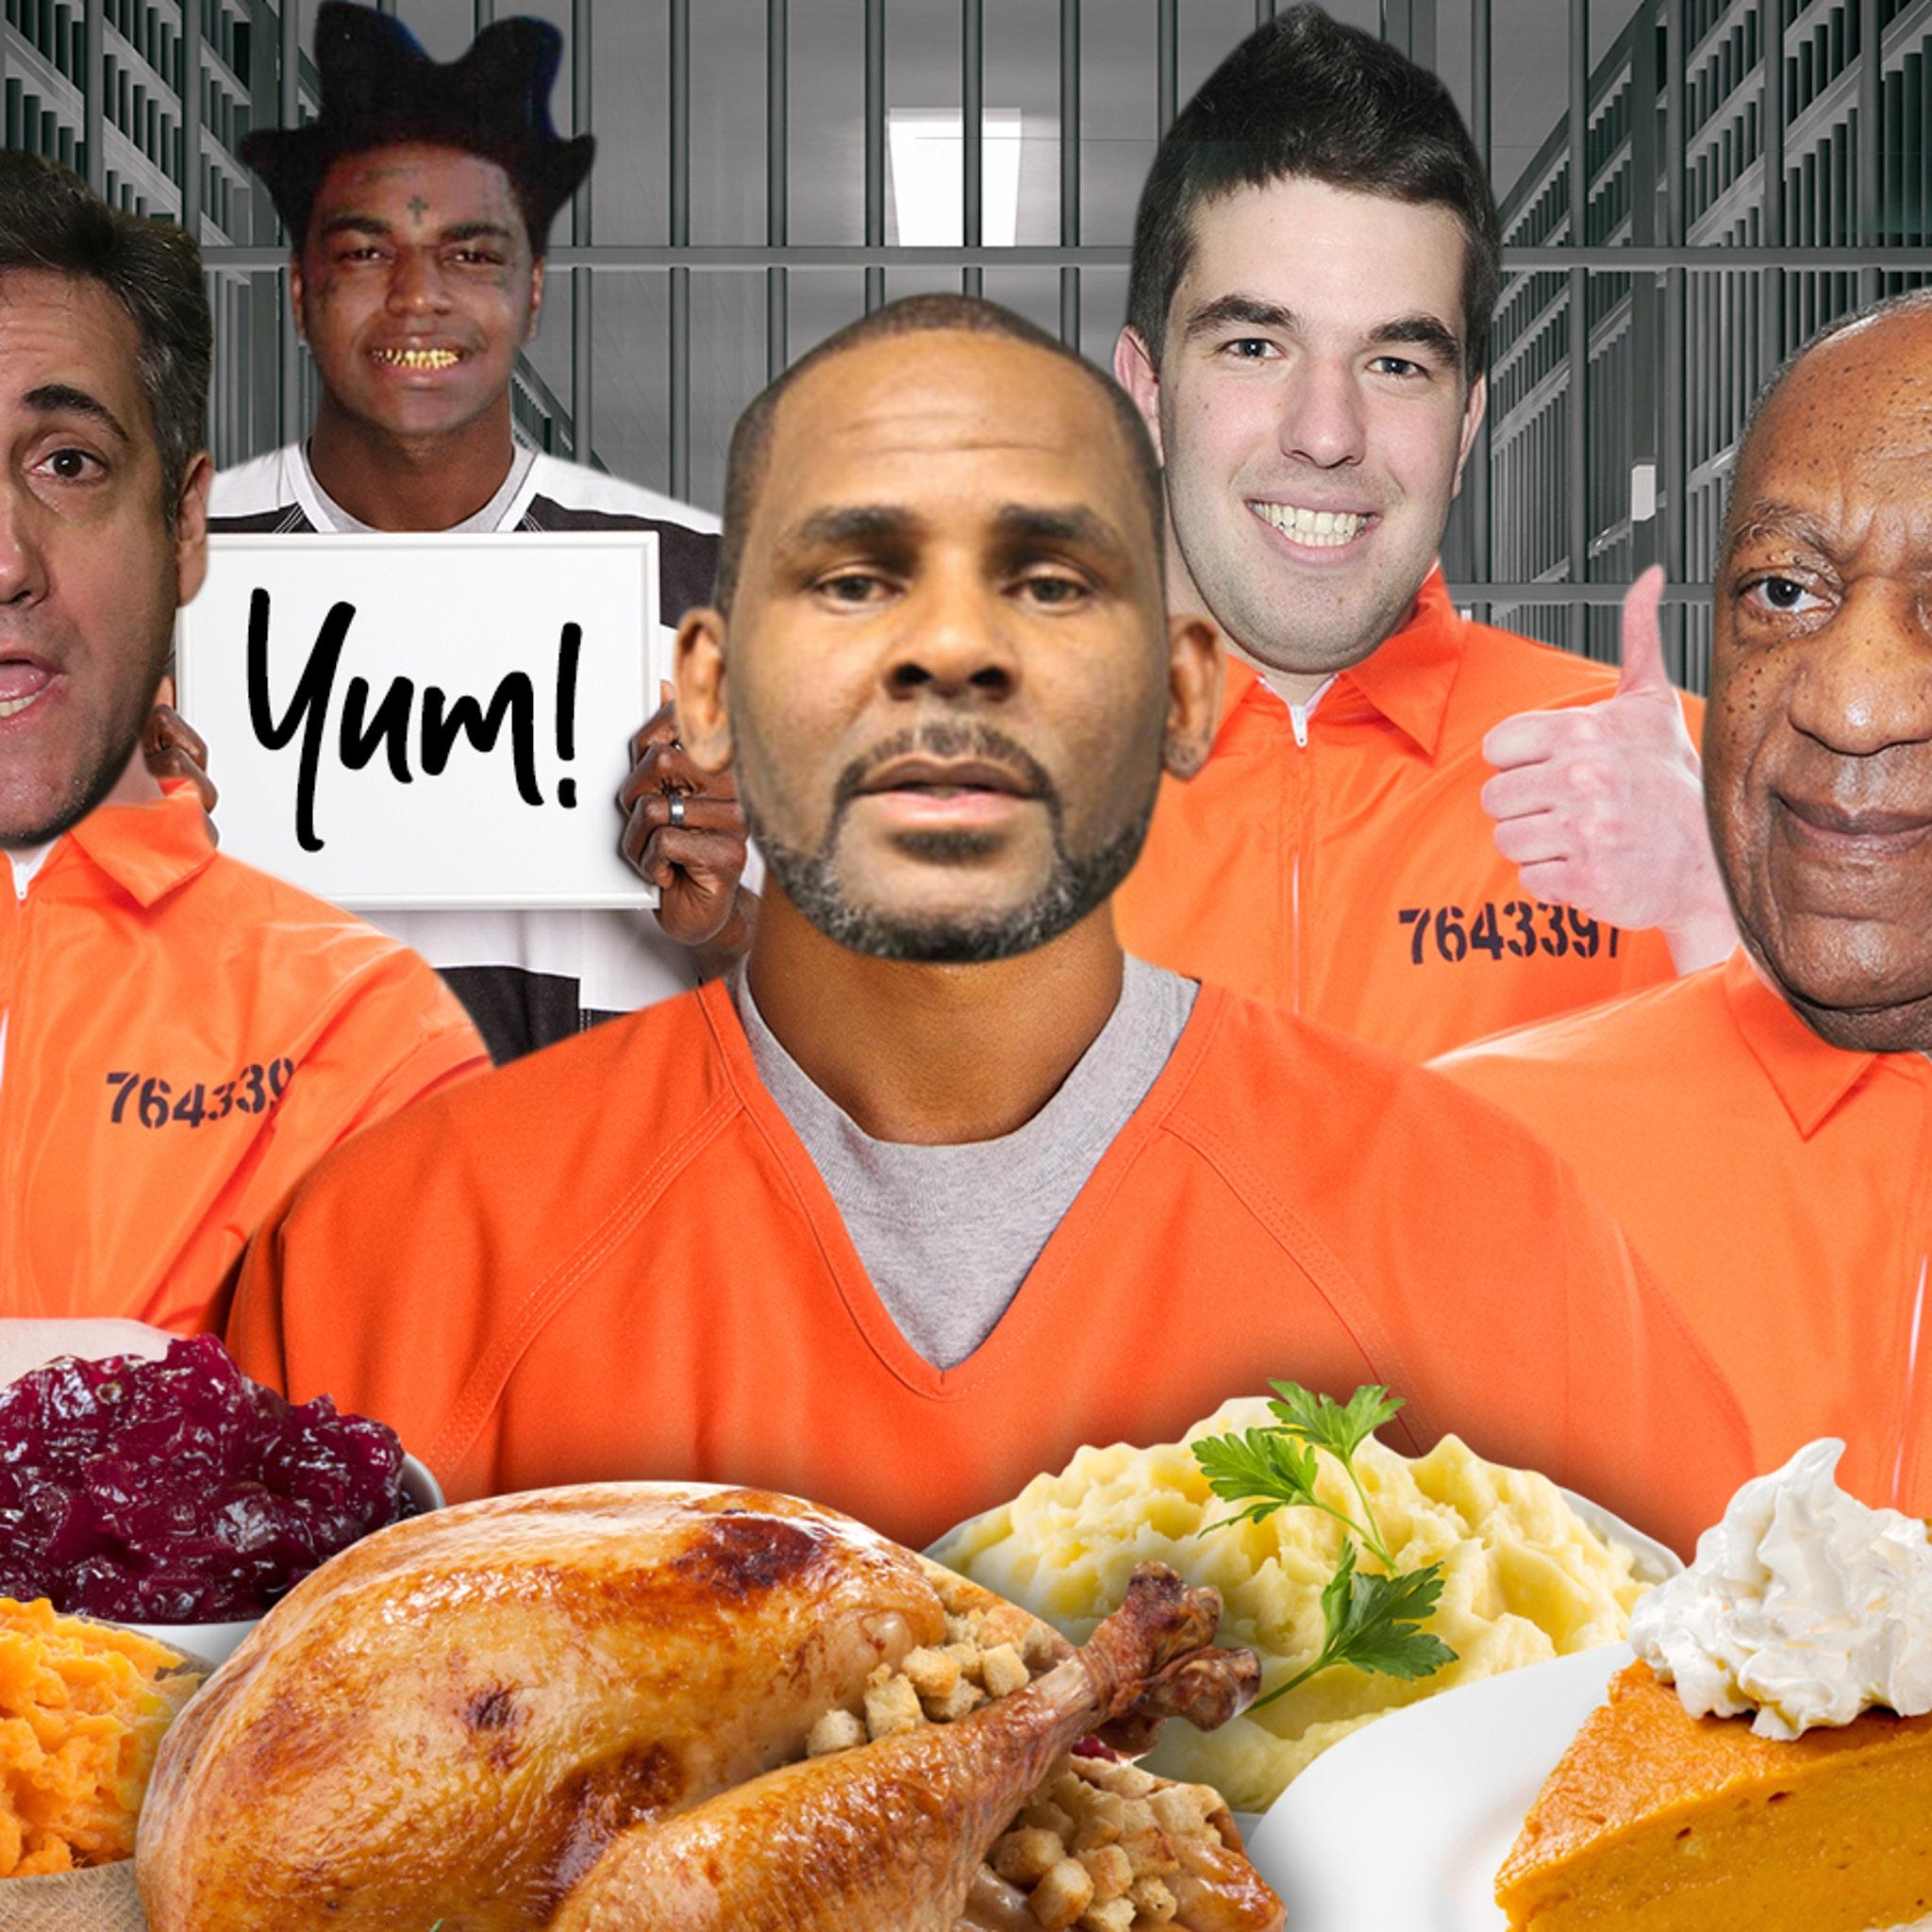 Celeb Prisoners' Thanksgiving Meals Revealed